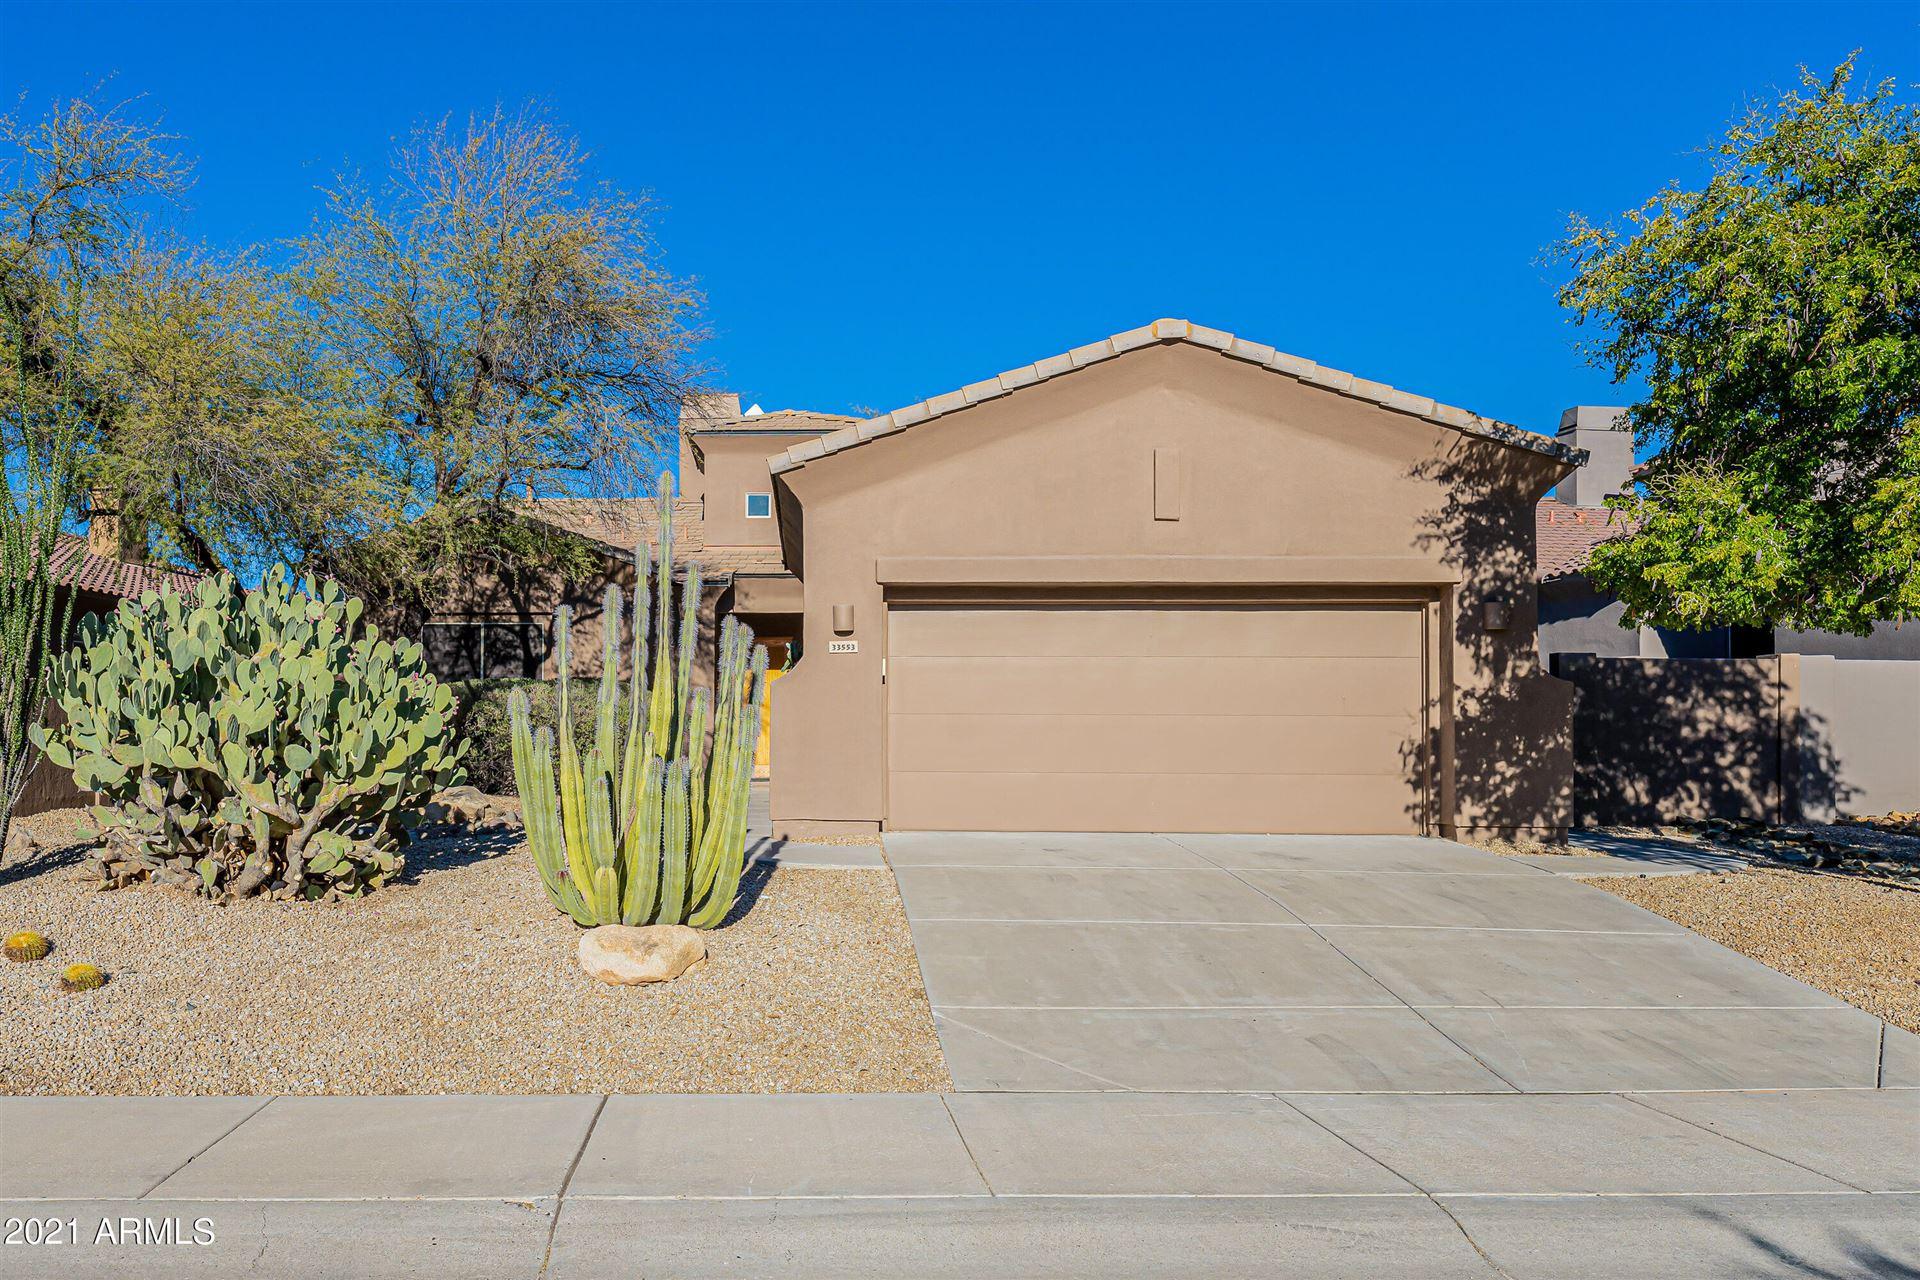 Photo for 33553 N 74th Street, Scottsdale, AZ 85266 (MLS # 6197409)